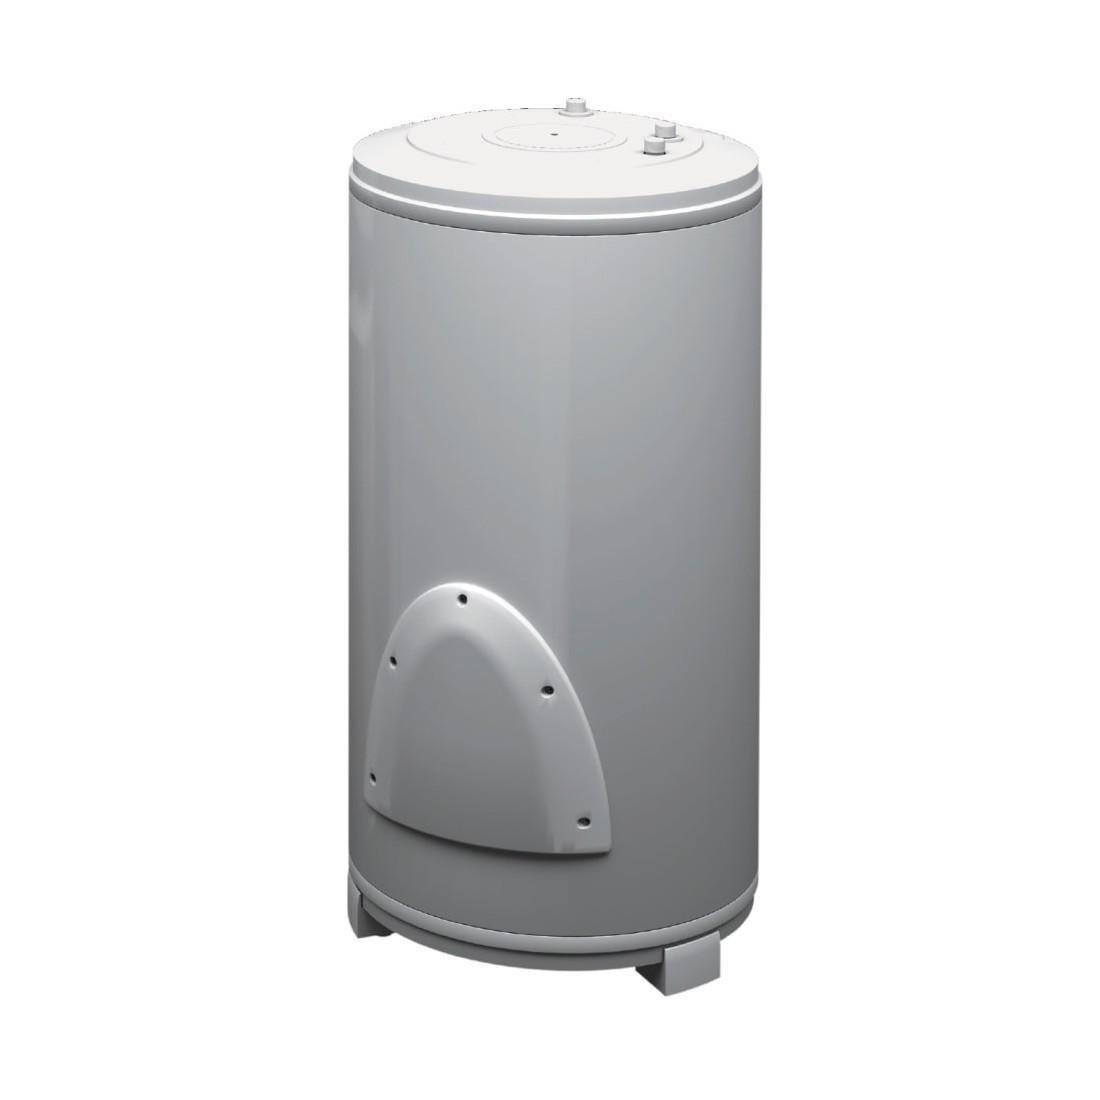 Šilumos siurblys Oras-Vanduo Ariston Nimbus, Flex, 110 S Net 16.74 kW Φ3, su 180 (177 l) vandens šildytuvu ir Wi-Fi